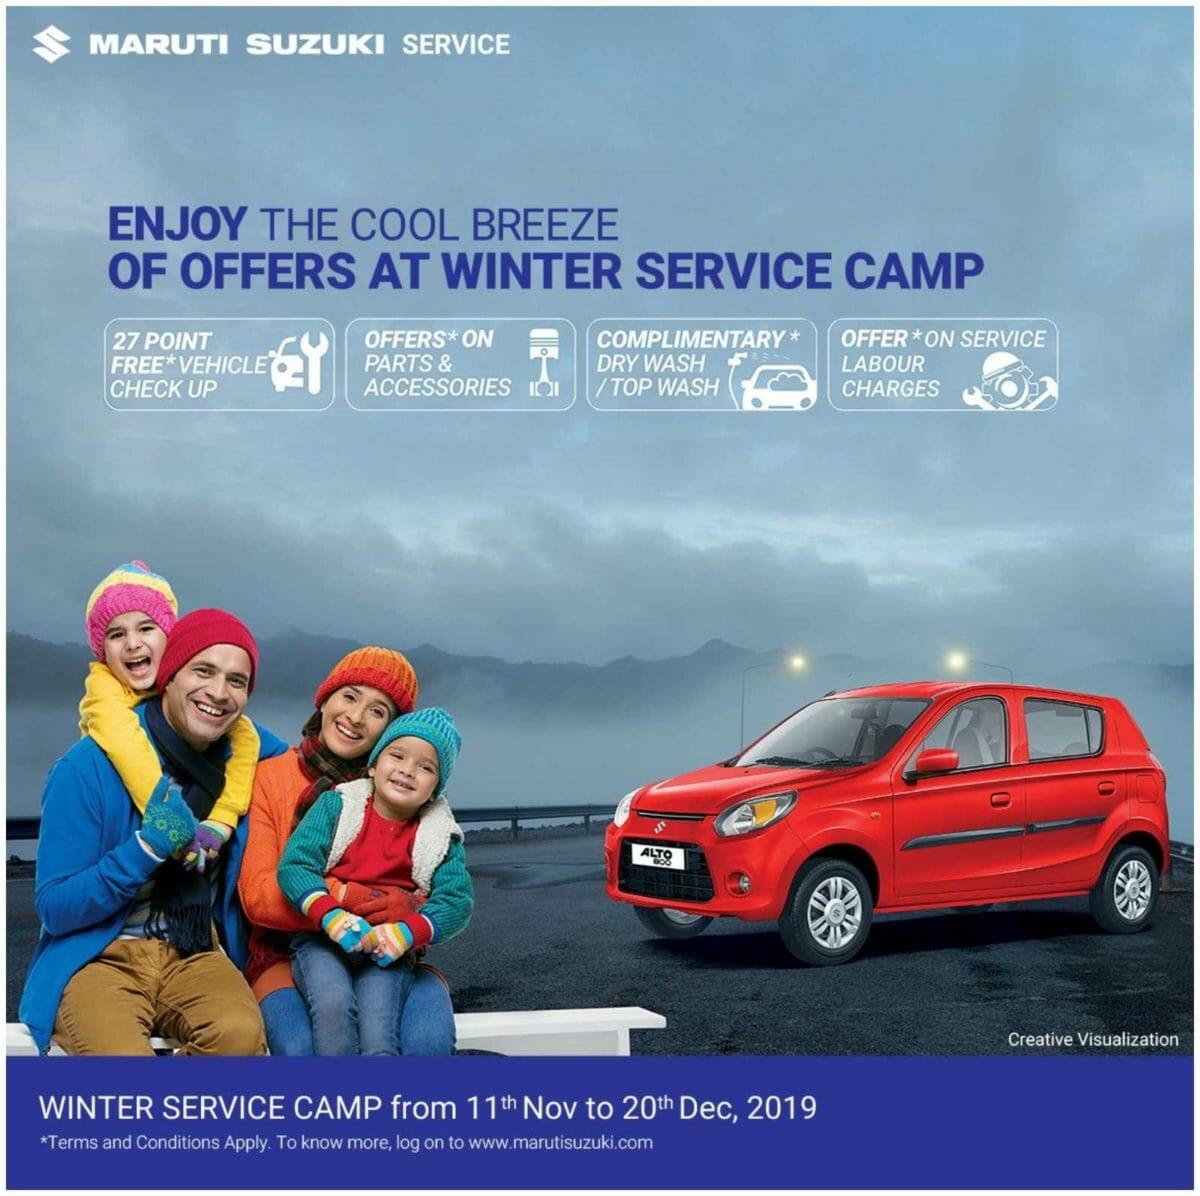 Maruti Suzuki Winter Service Camp 2